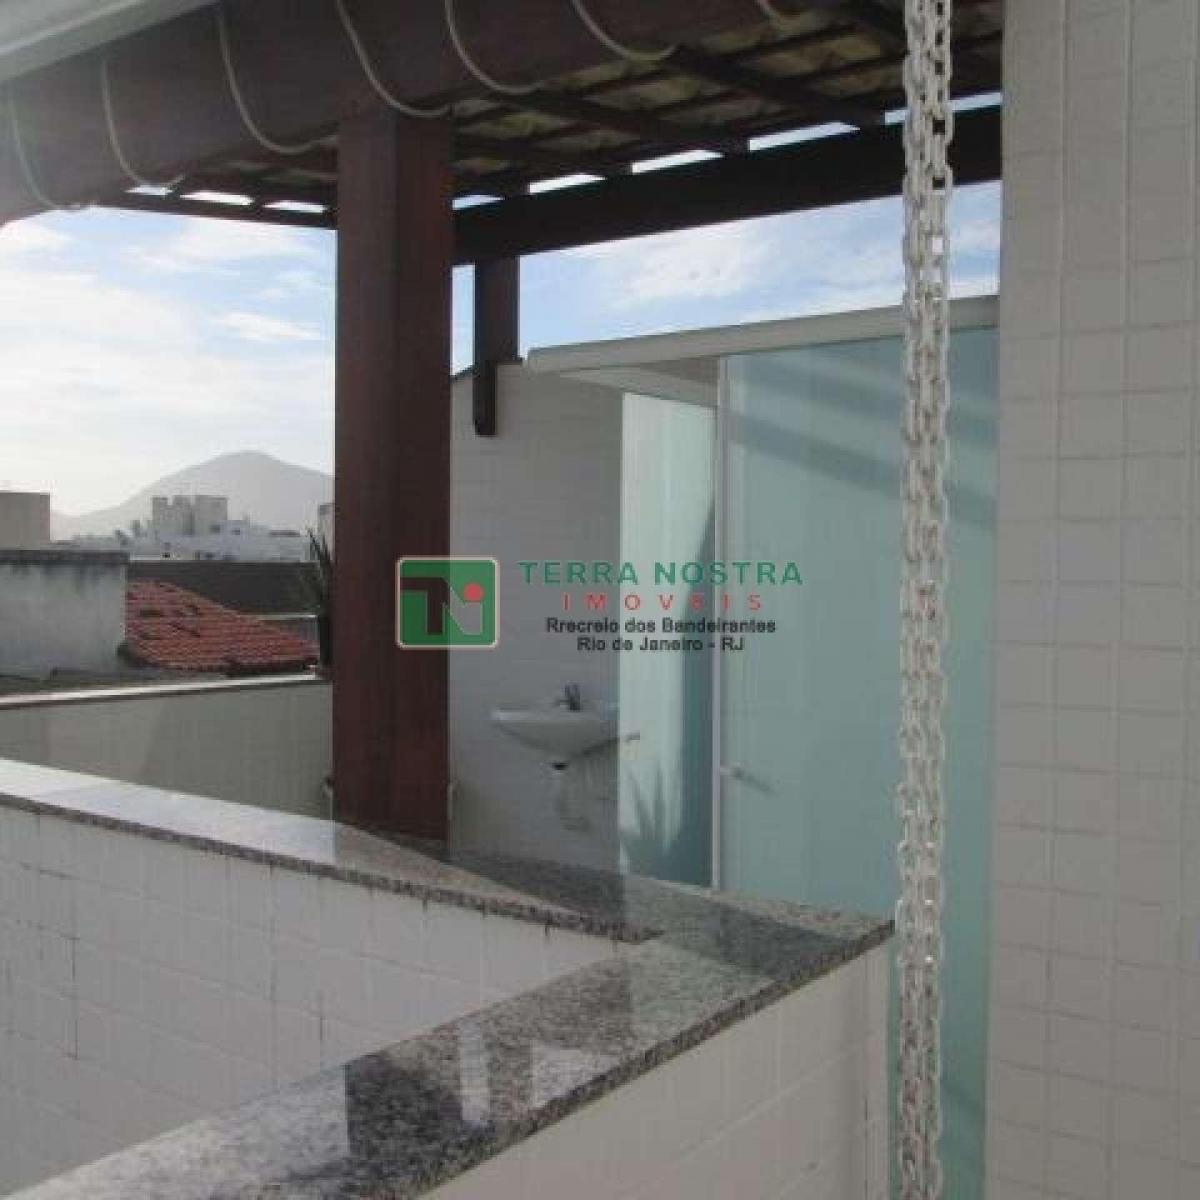 Imagens de #50647B  Janeiro Recreio dos Bandeirantes Cobertura em Recreio dos Bandeirantes 1200x1200 px 2762 Box Banheiro Nucleo Bandeirante